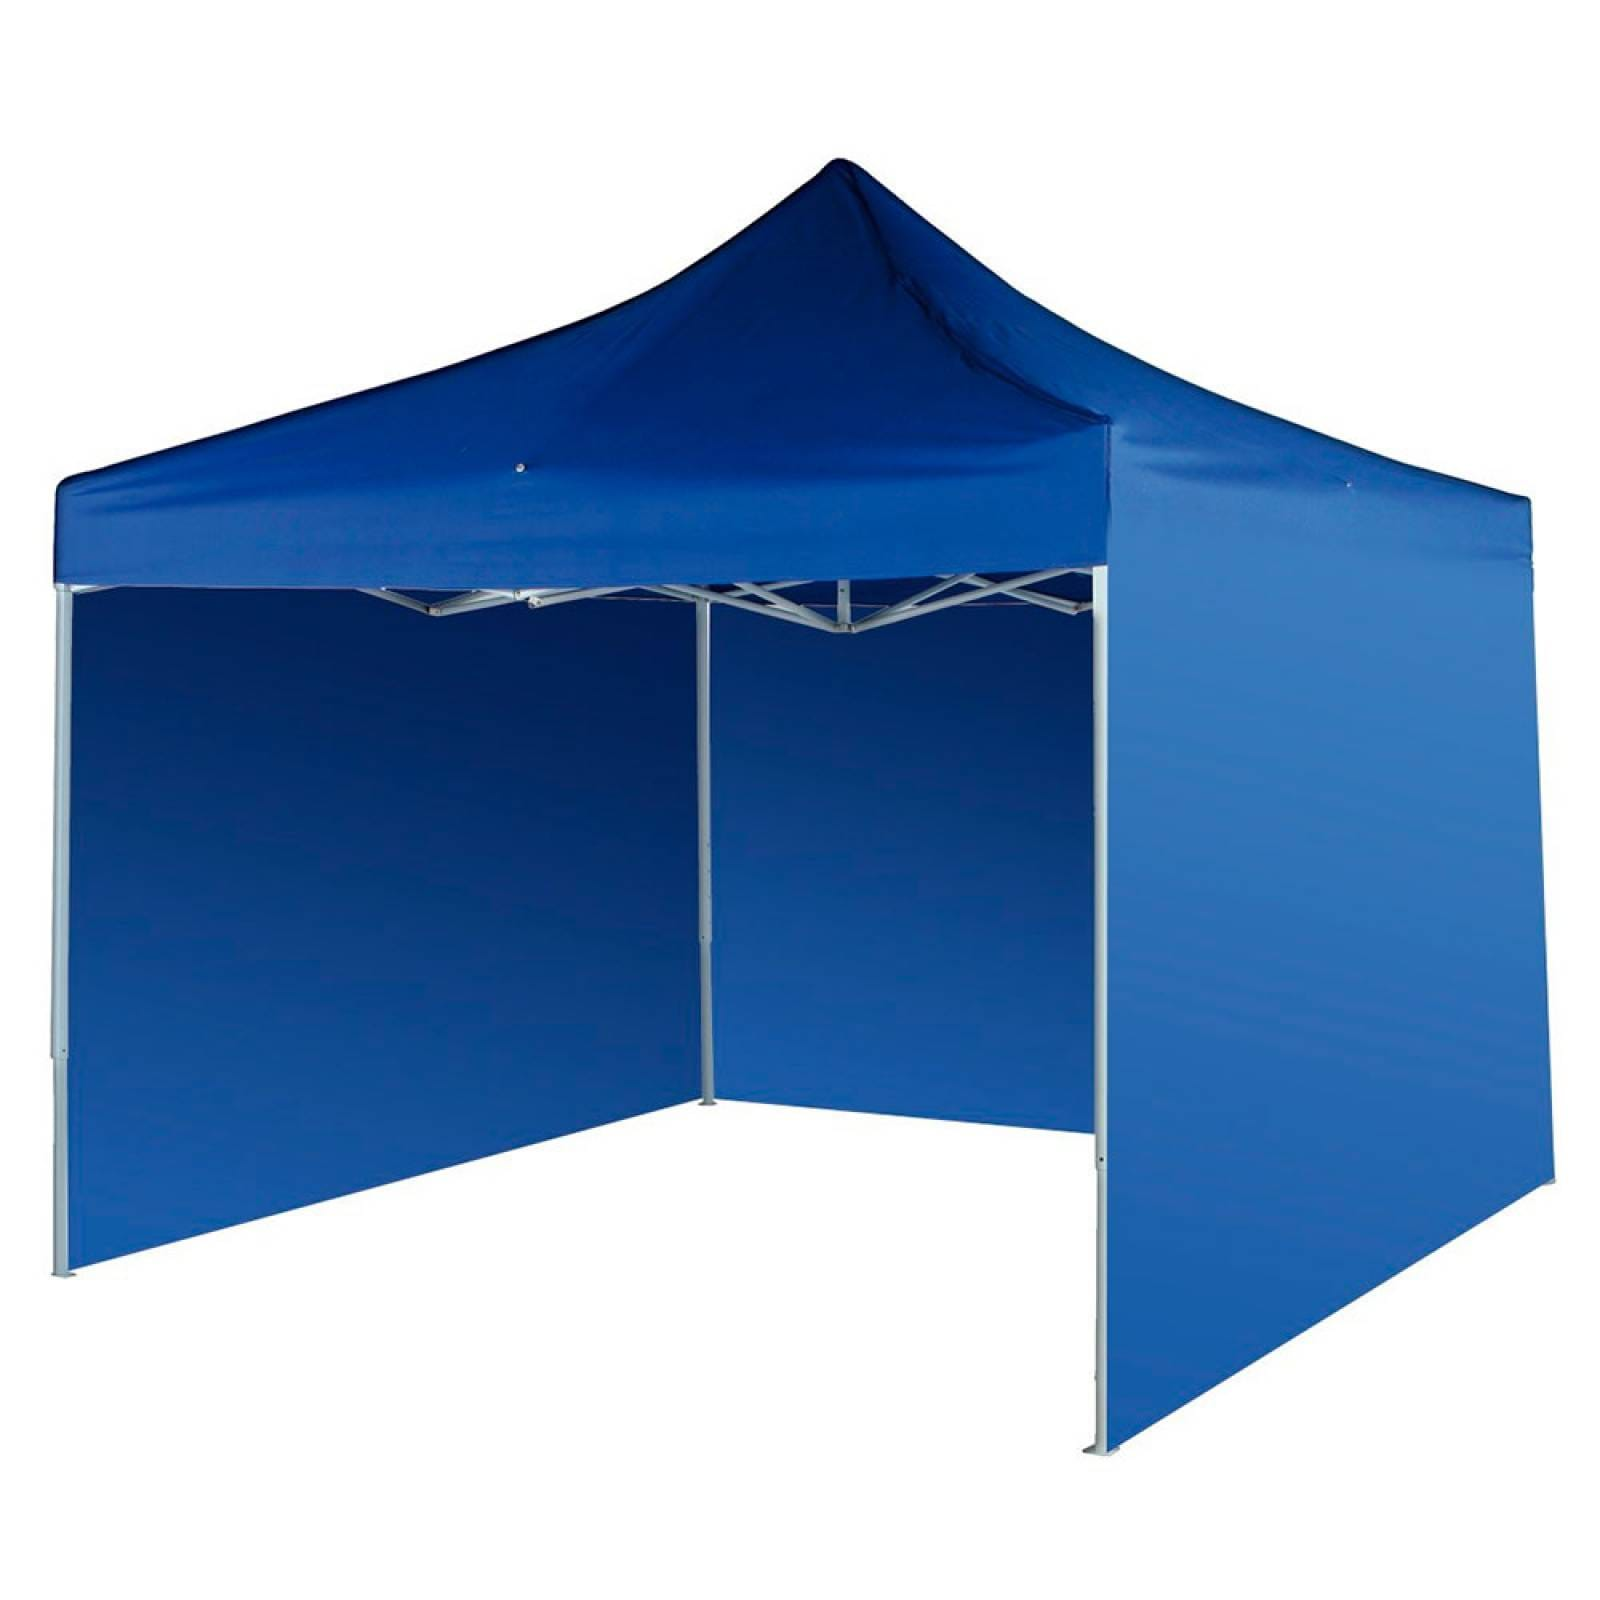 Carpa 3x3 Toldo Plegable Reforzado Impermeable  Lona Azul Jardin Exterior